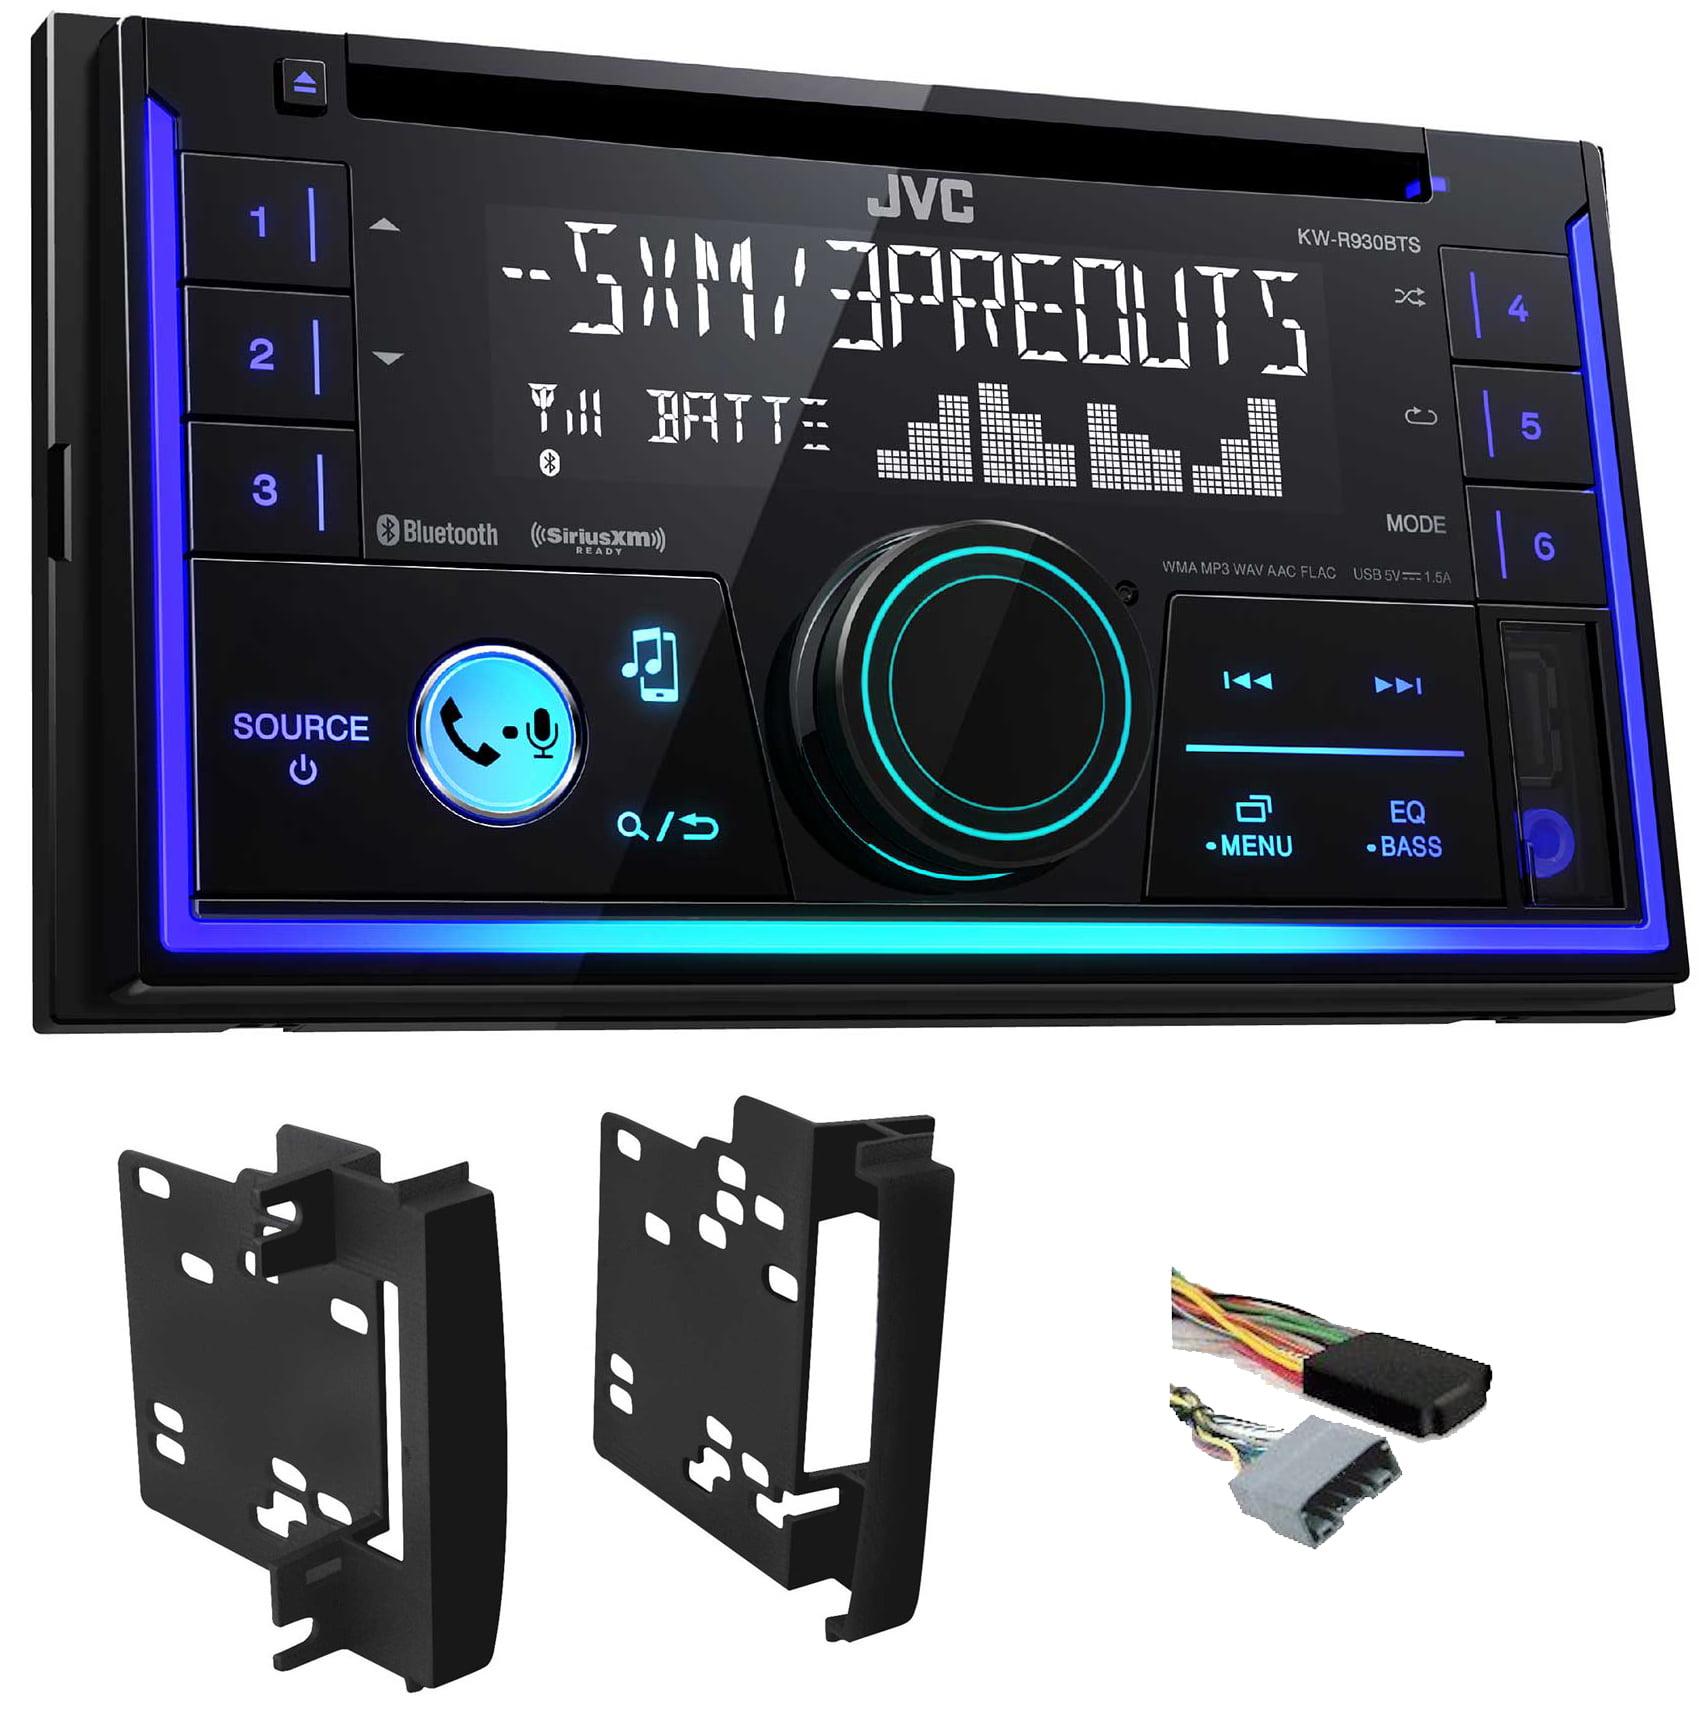 11-12 Dodge Ram 4500 5500 JVC Car CD Receiver w Bluetooth USB iPhone Sirius by JVC